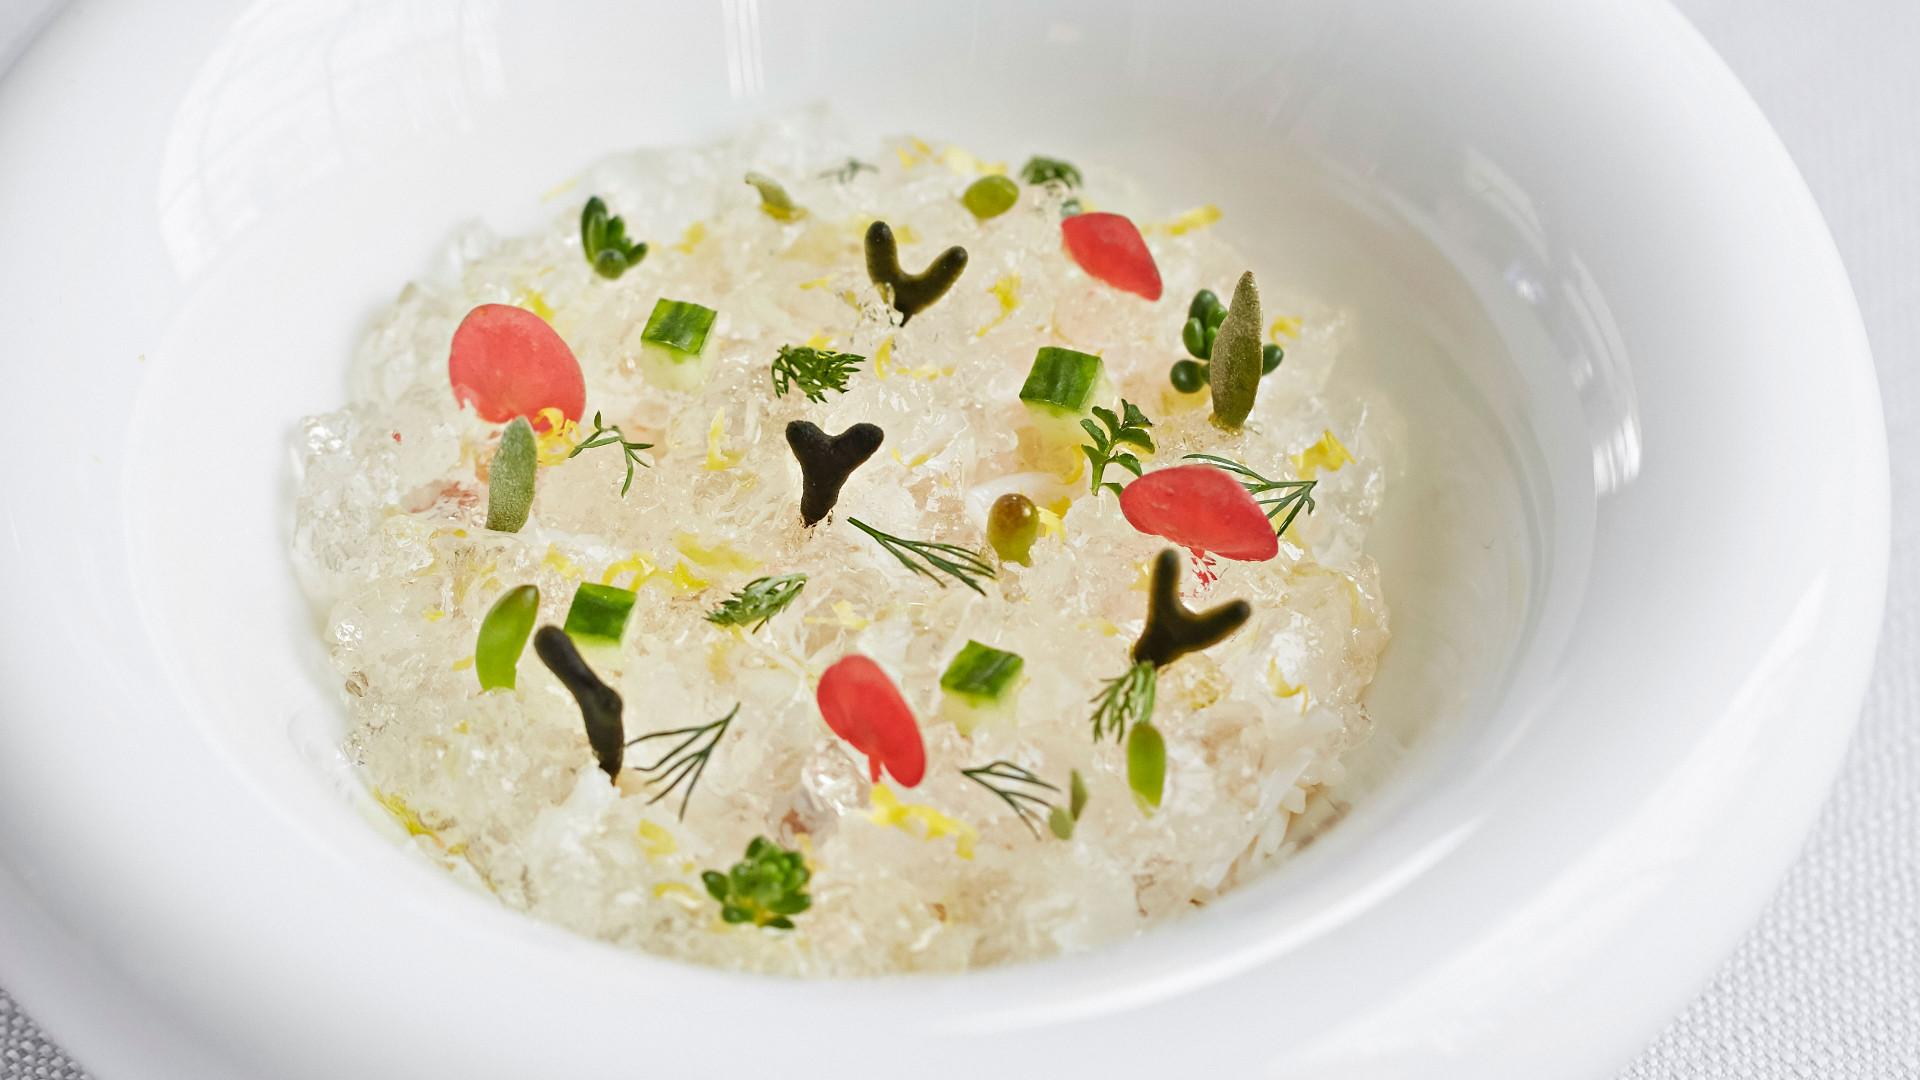 Crab and elderflower jelly